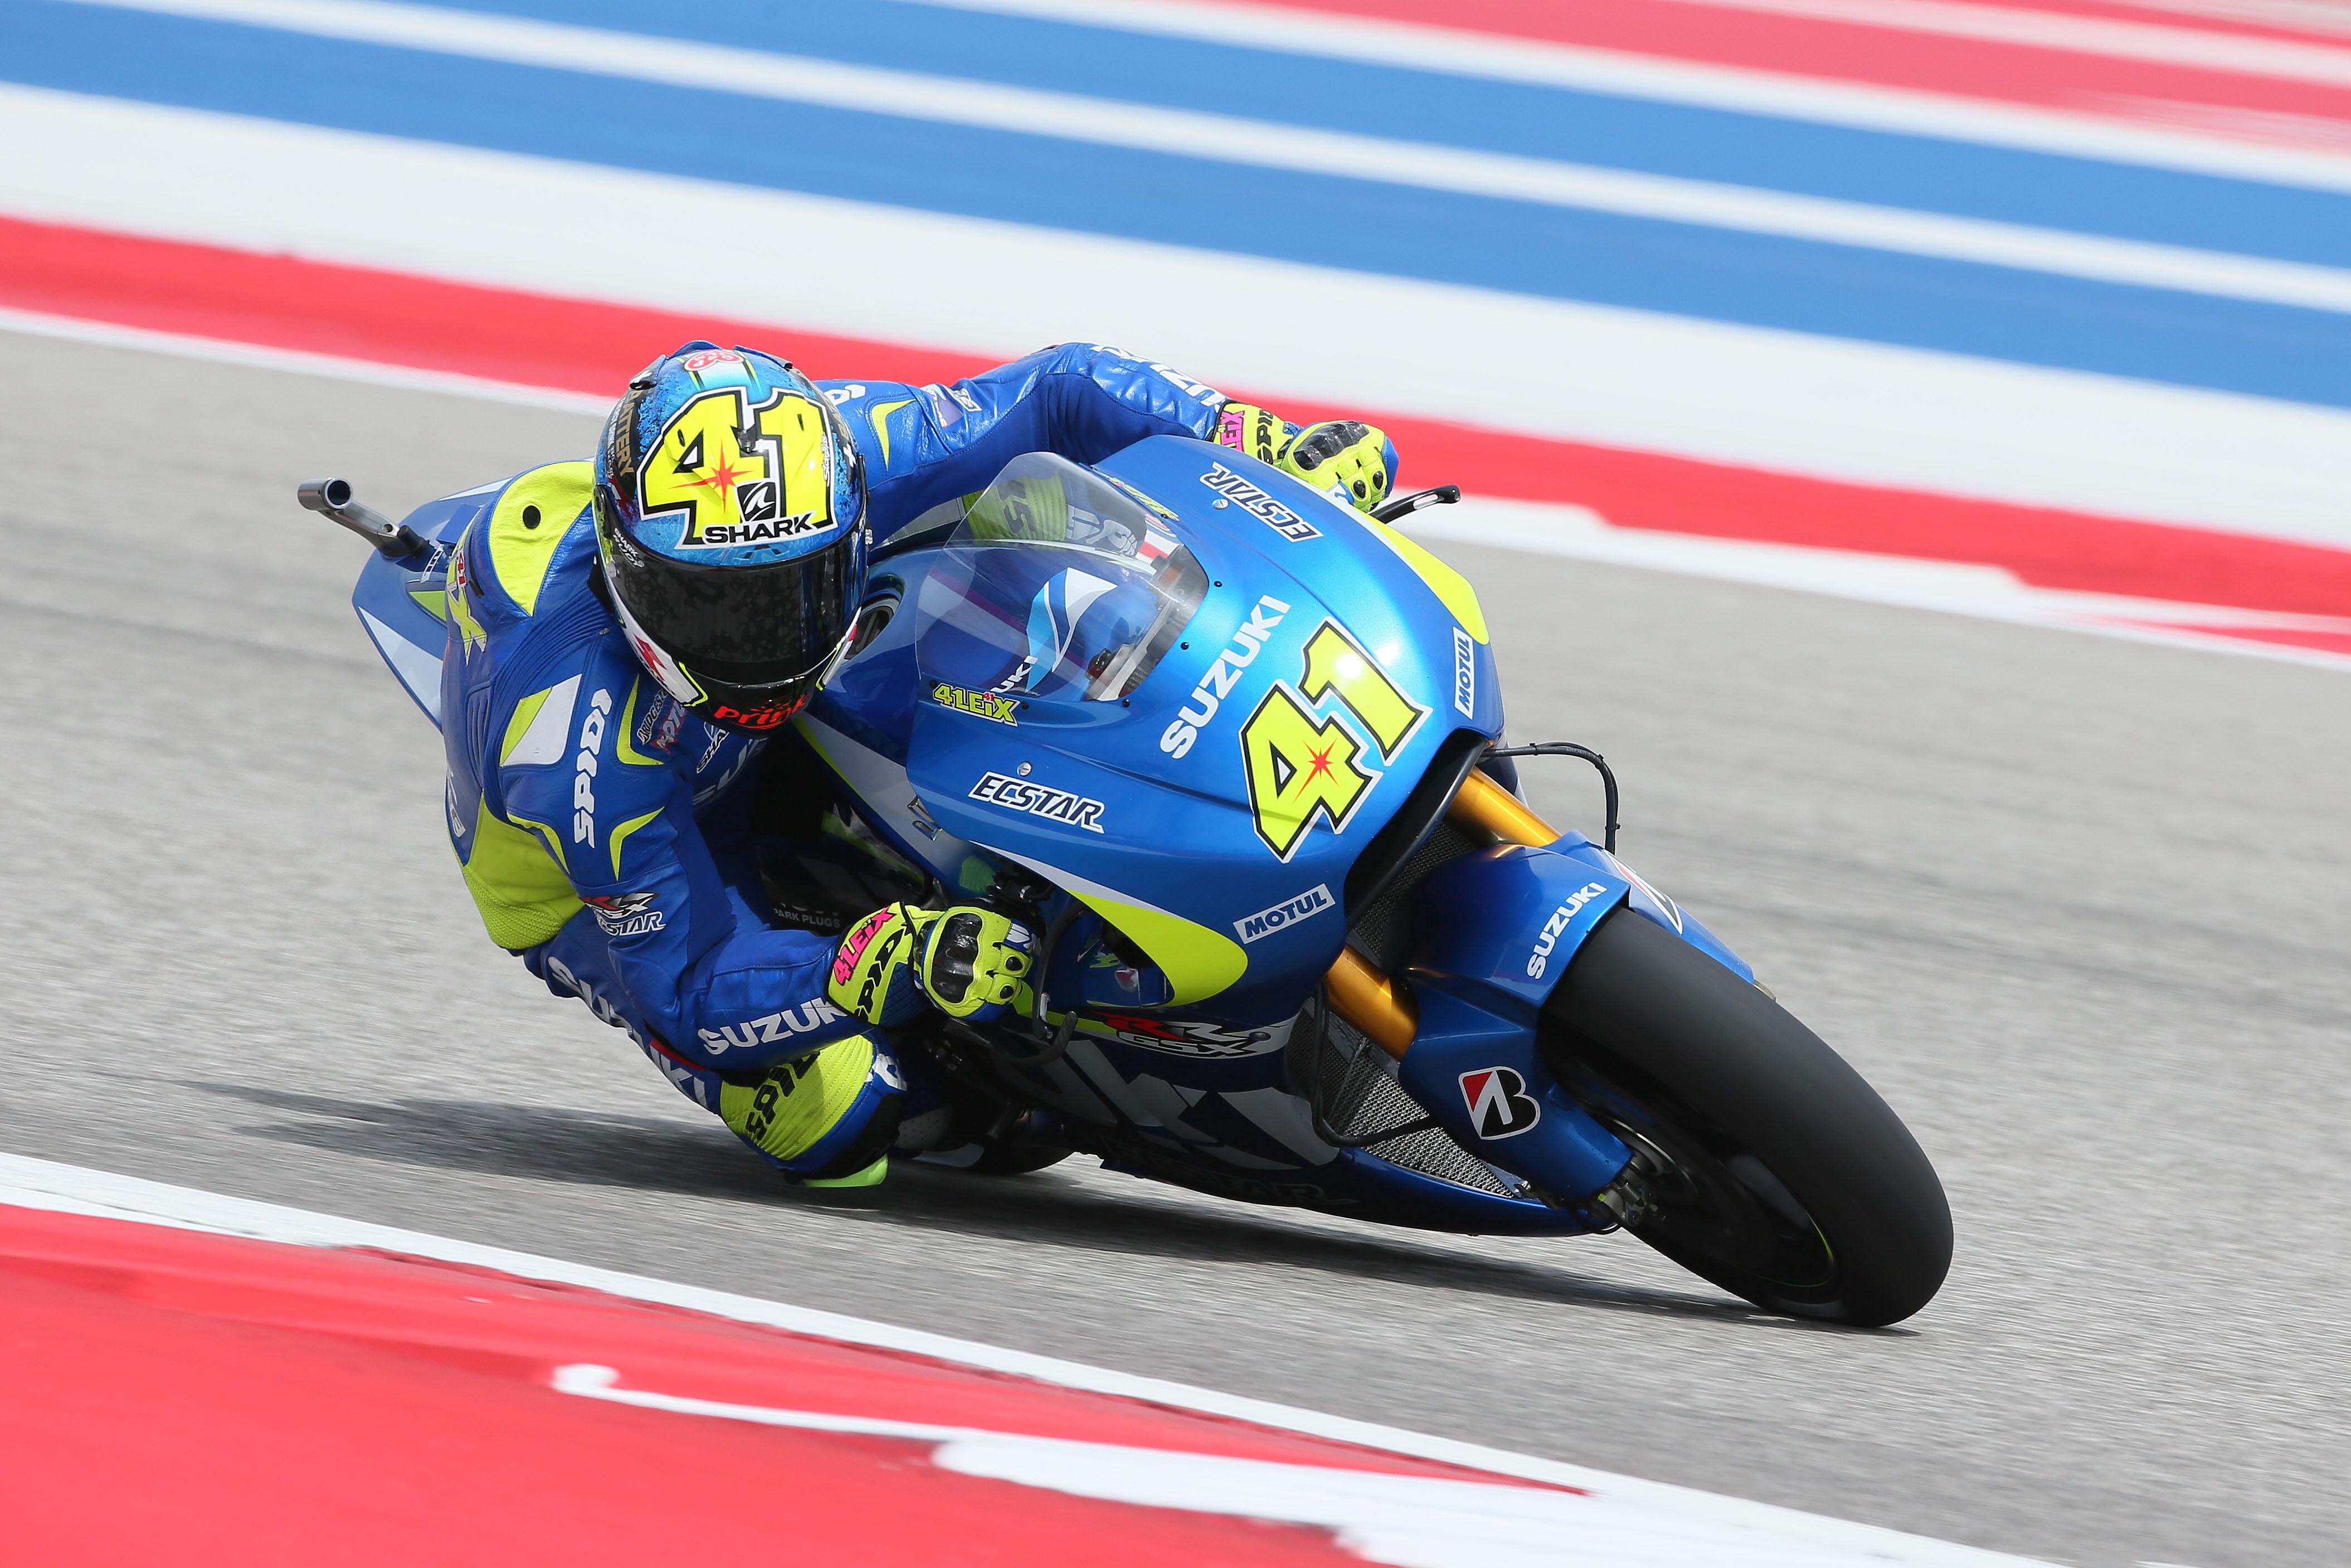 Aleix Espargaro Austin MotoGP 2015